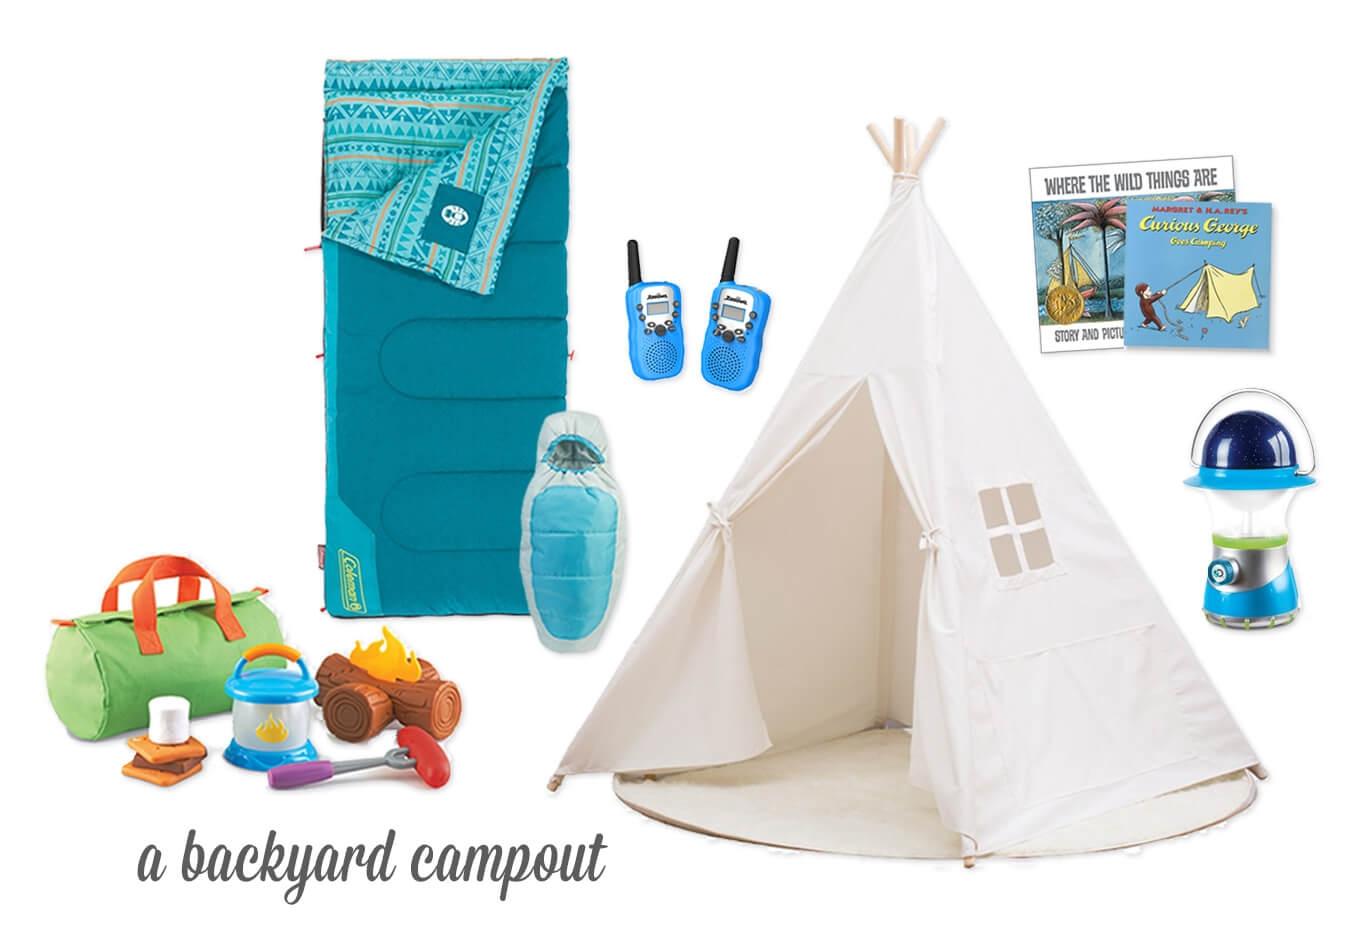 Camp Cook Kit / Kids + Doll Sleeping Bags / Walkie Talkies / Teepee / Camping Book Classics / Starry Night Lantern